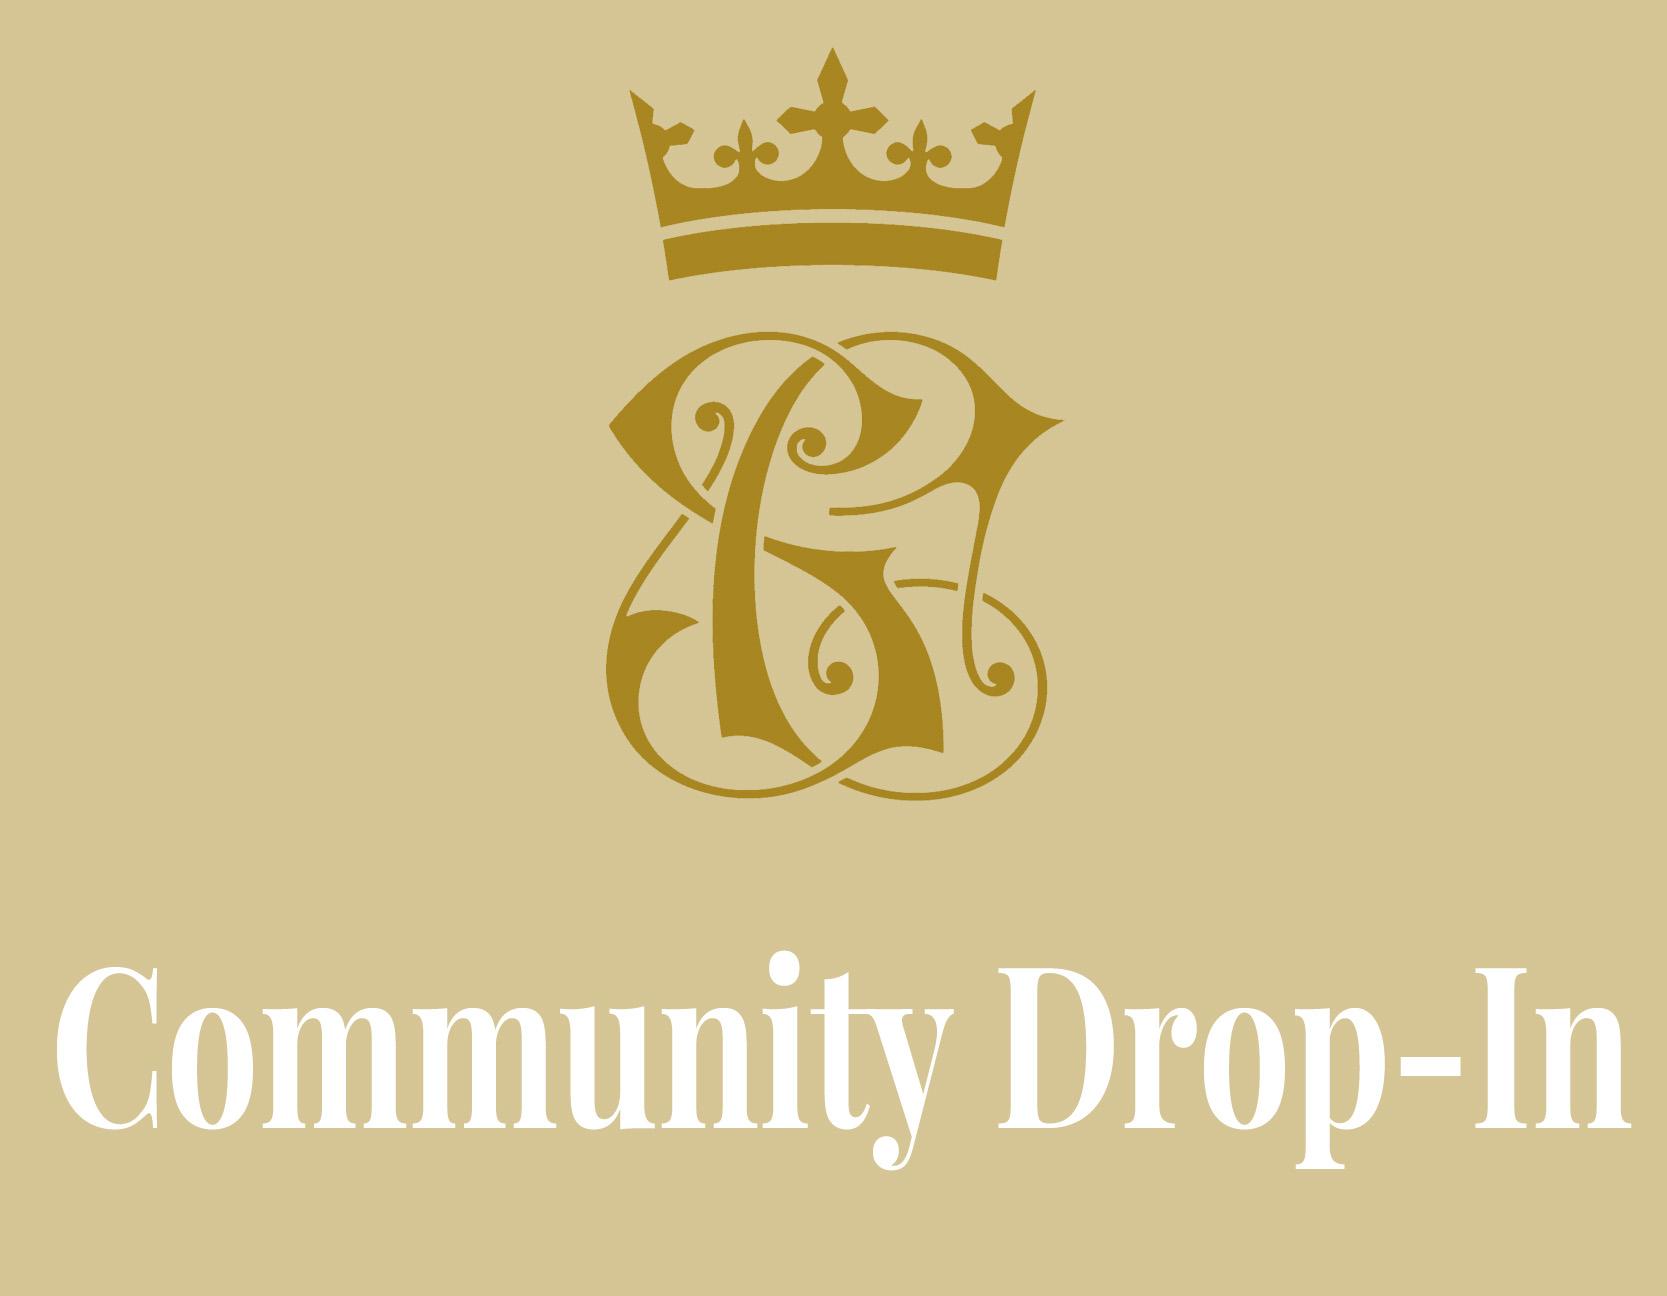 Community Drop-In